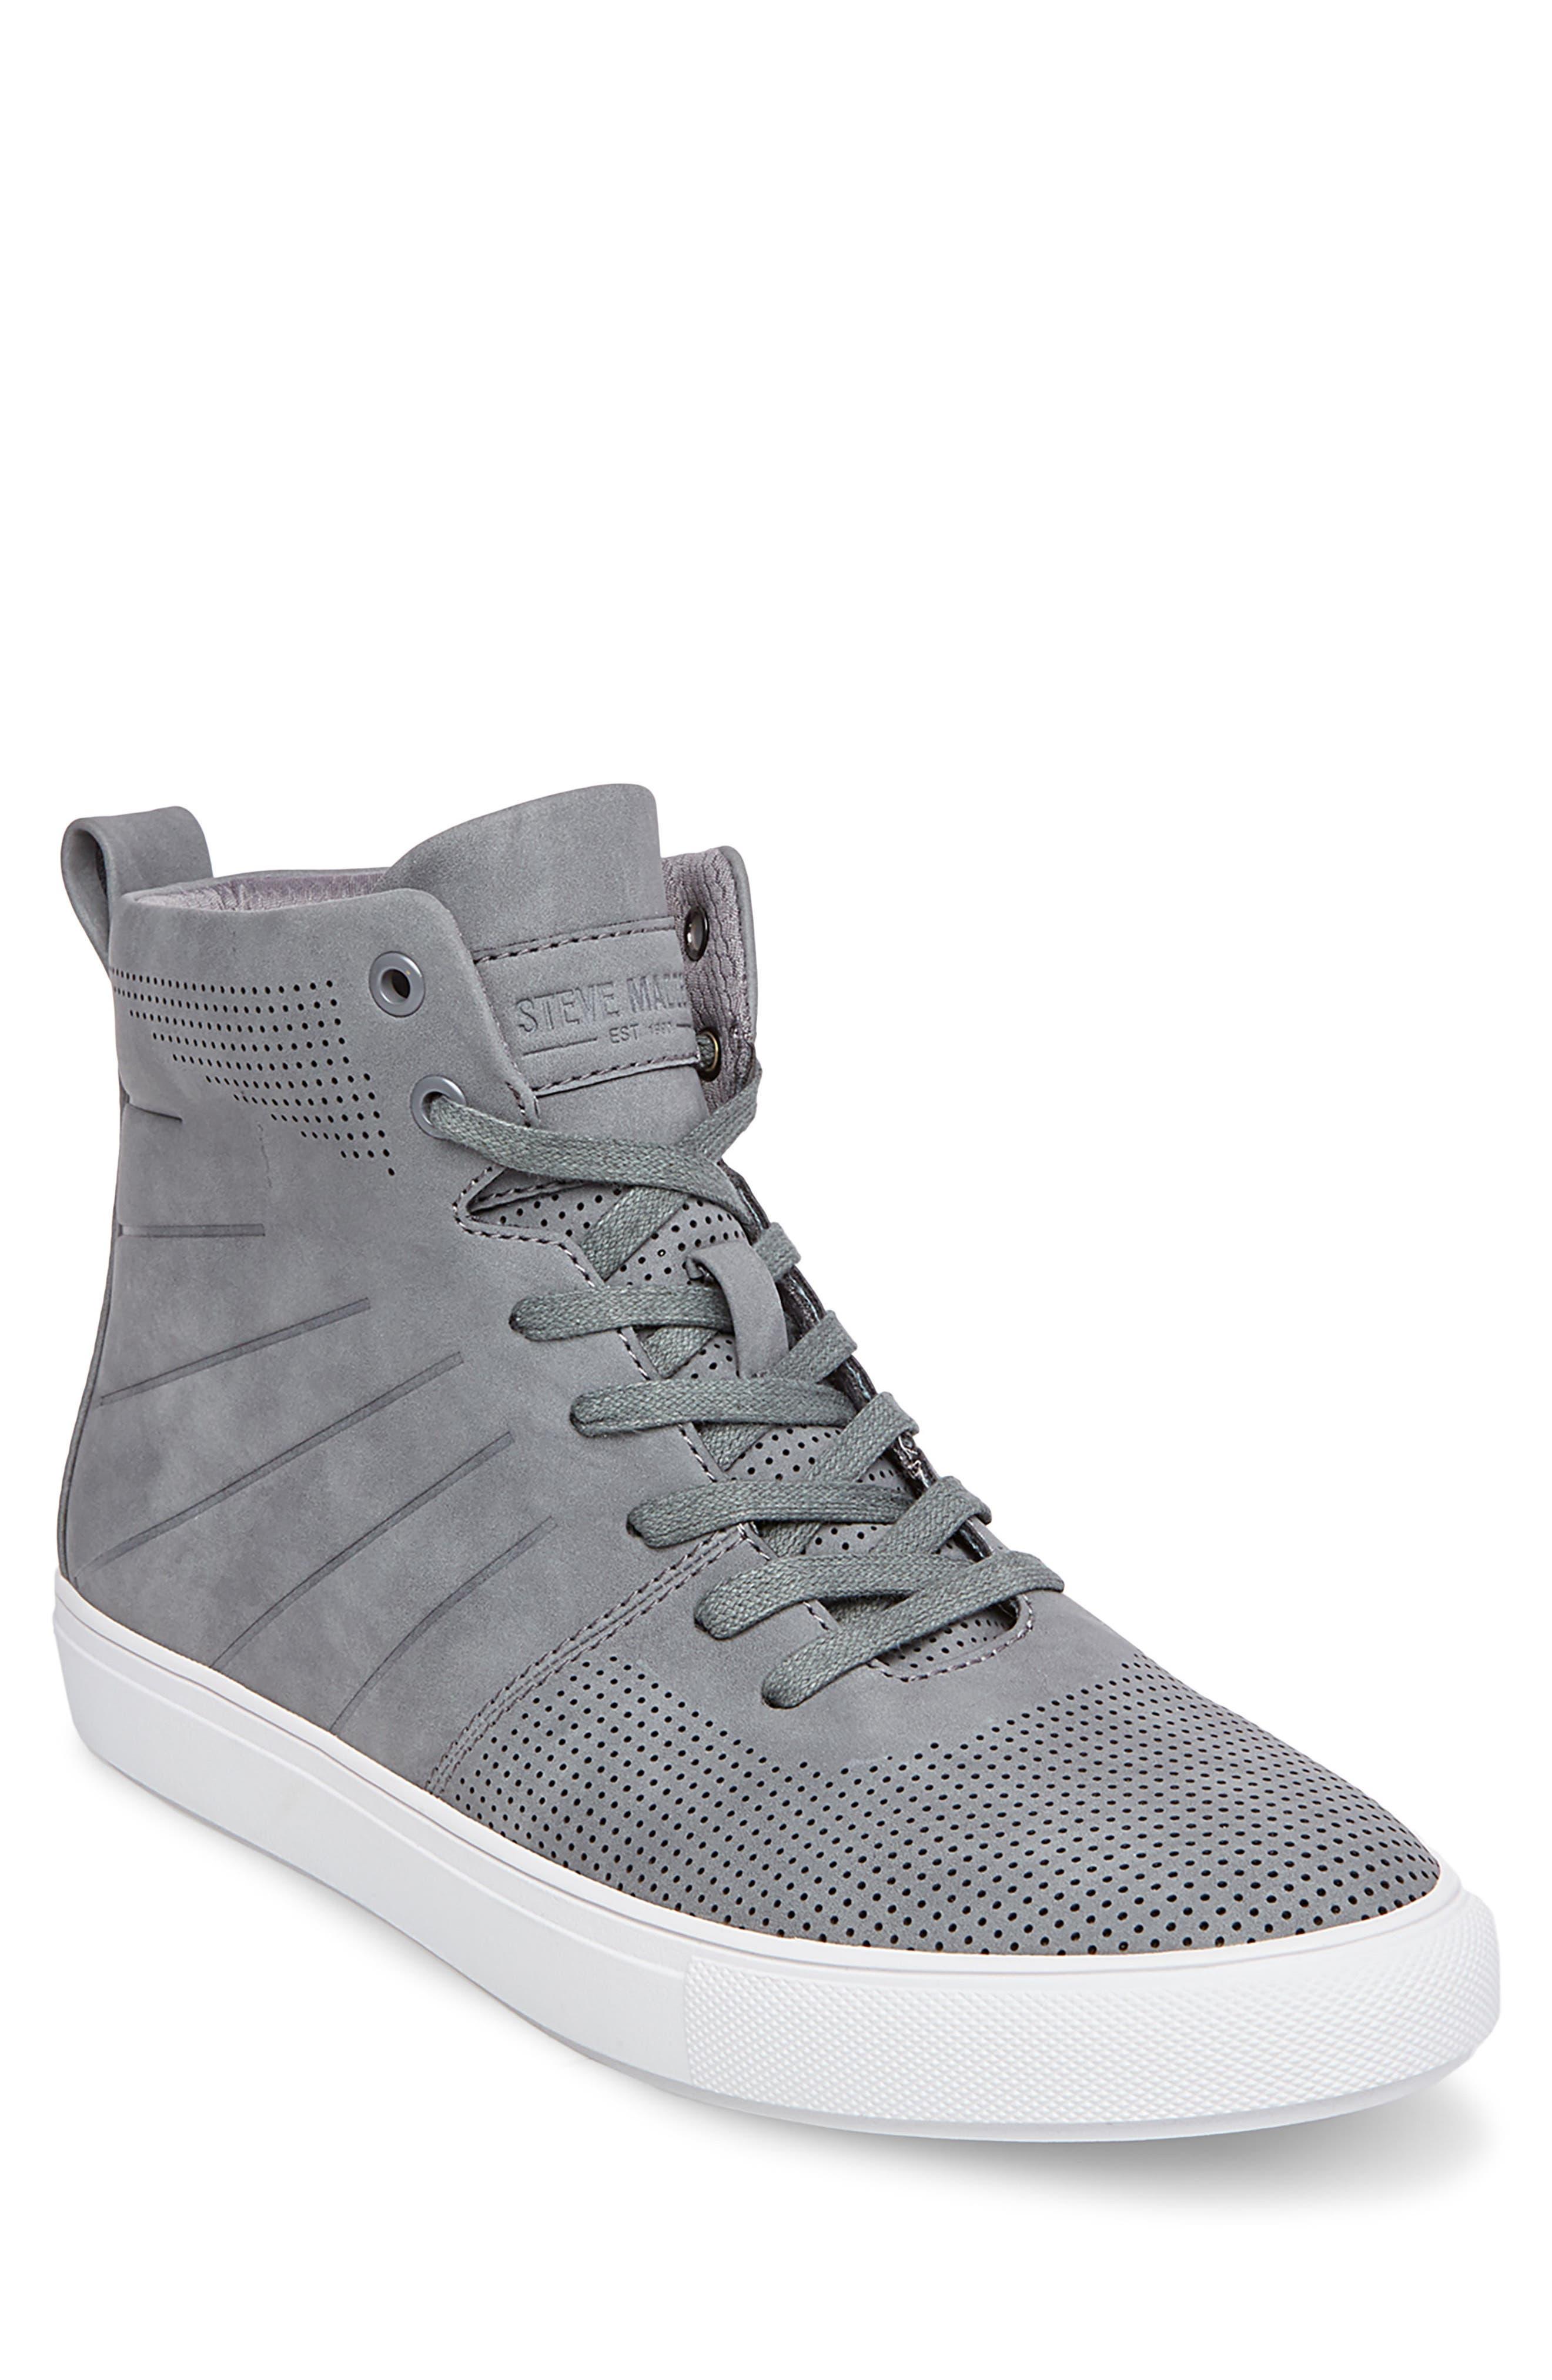 Eskape Sneaker,                         Main,                         color, Grey